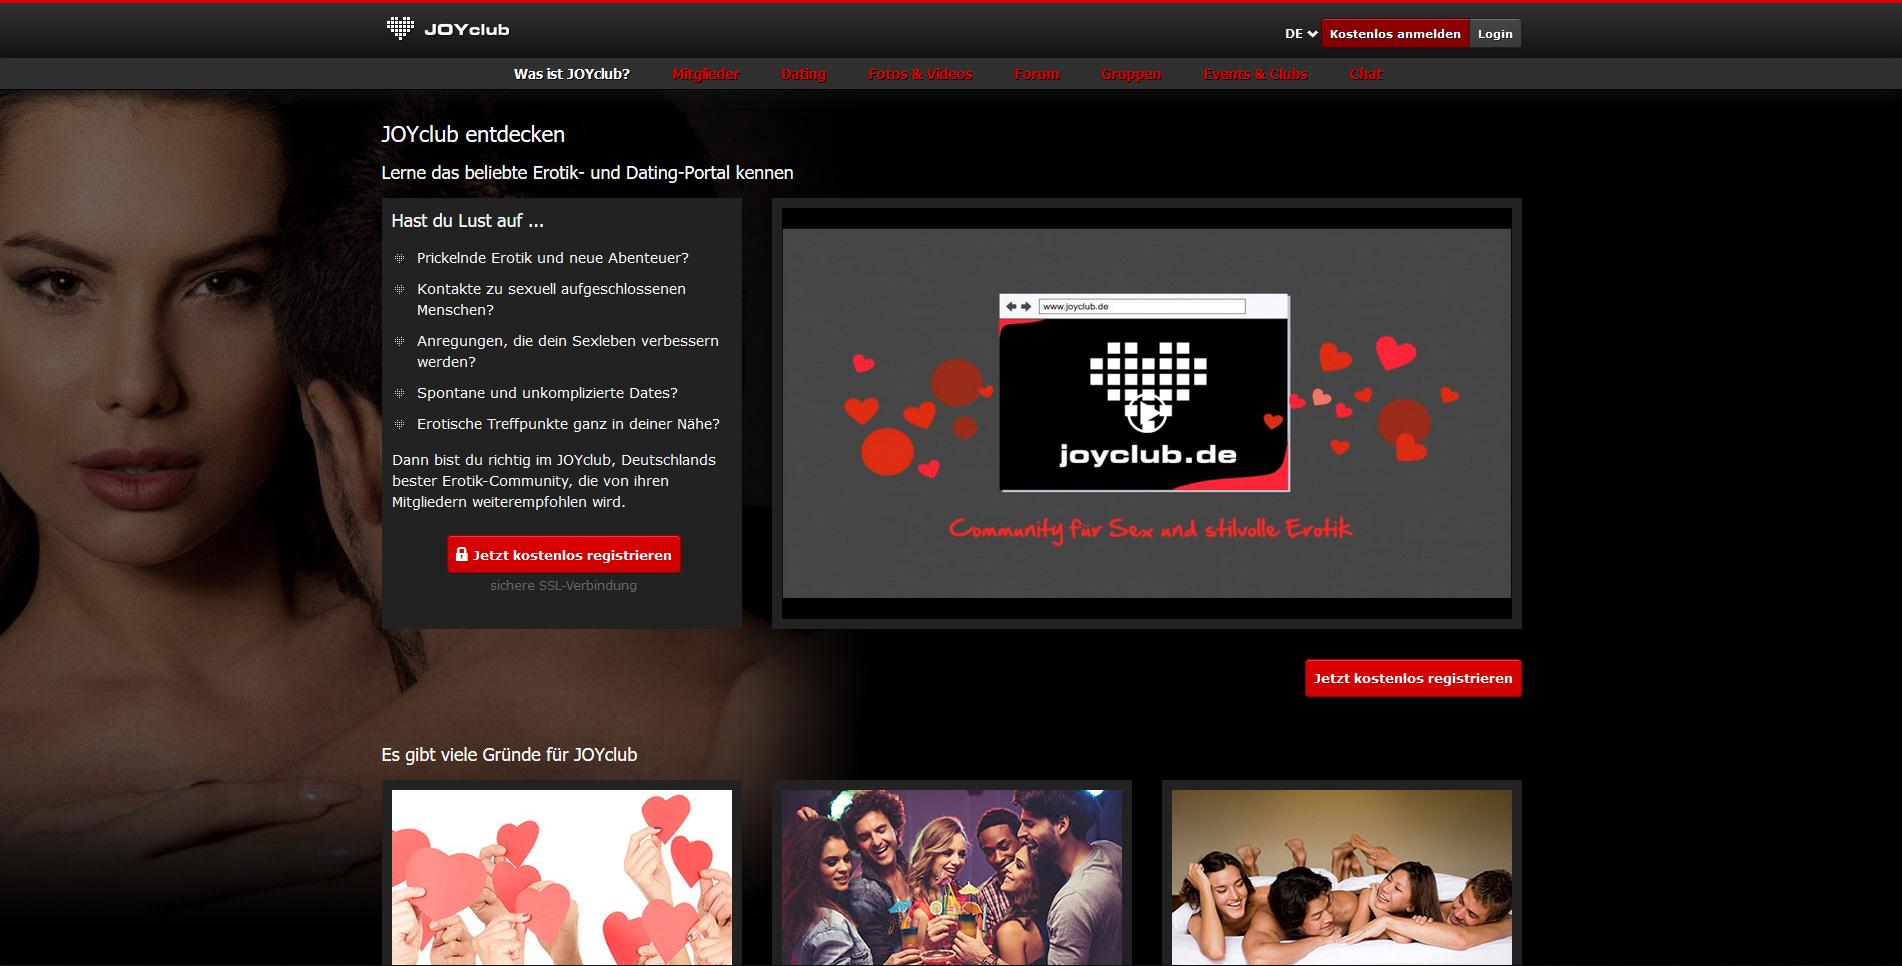 Joyclub.De/Login/